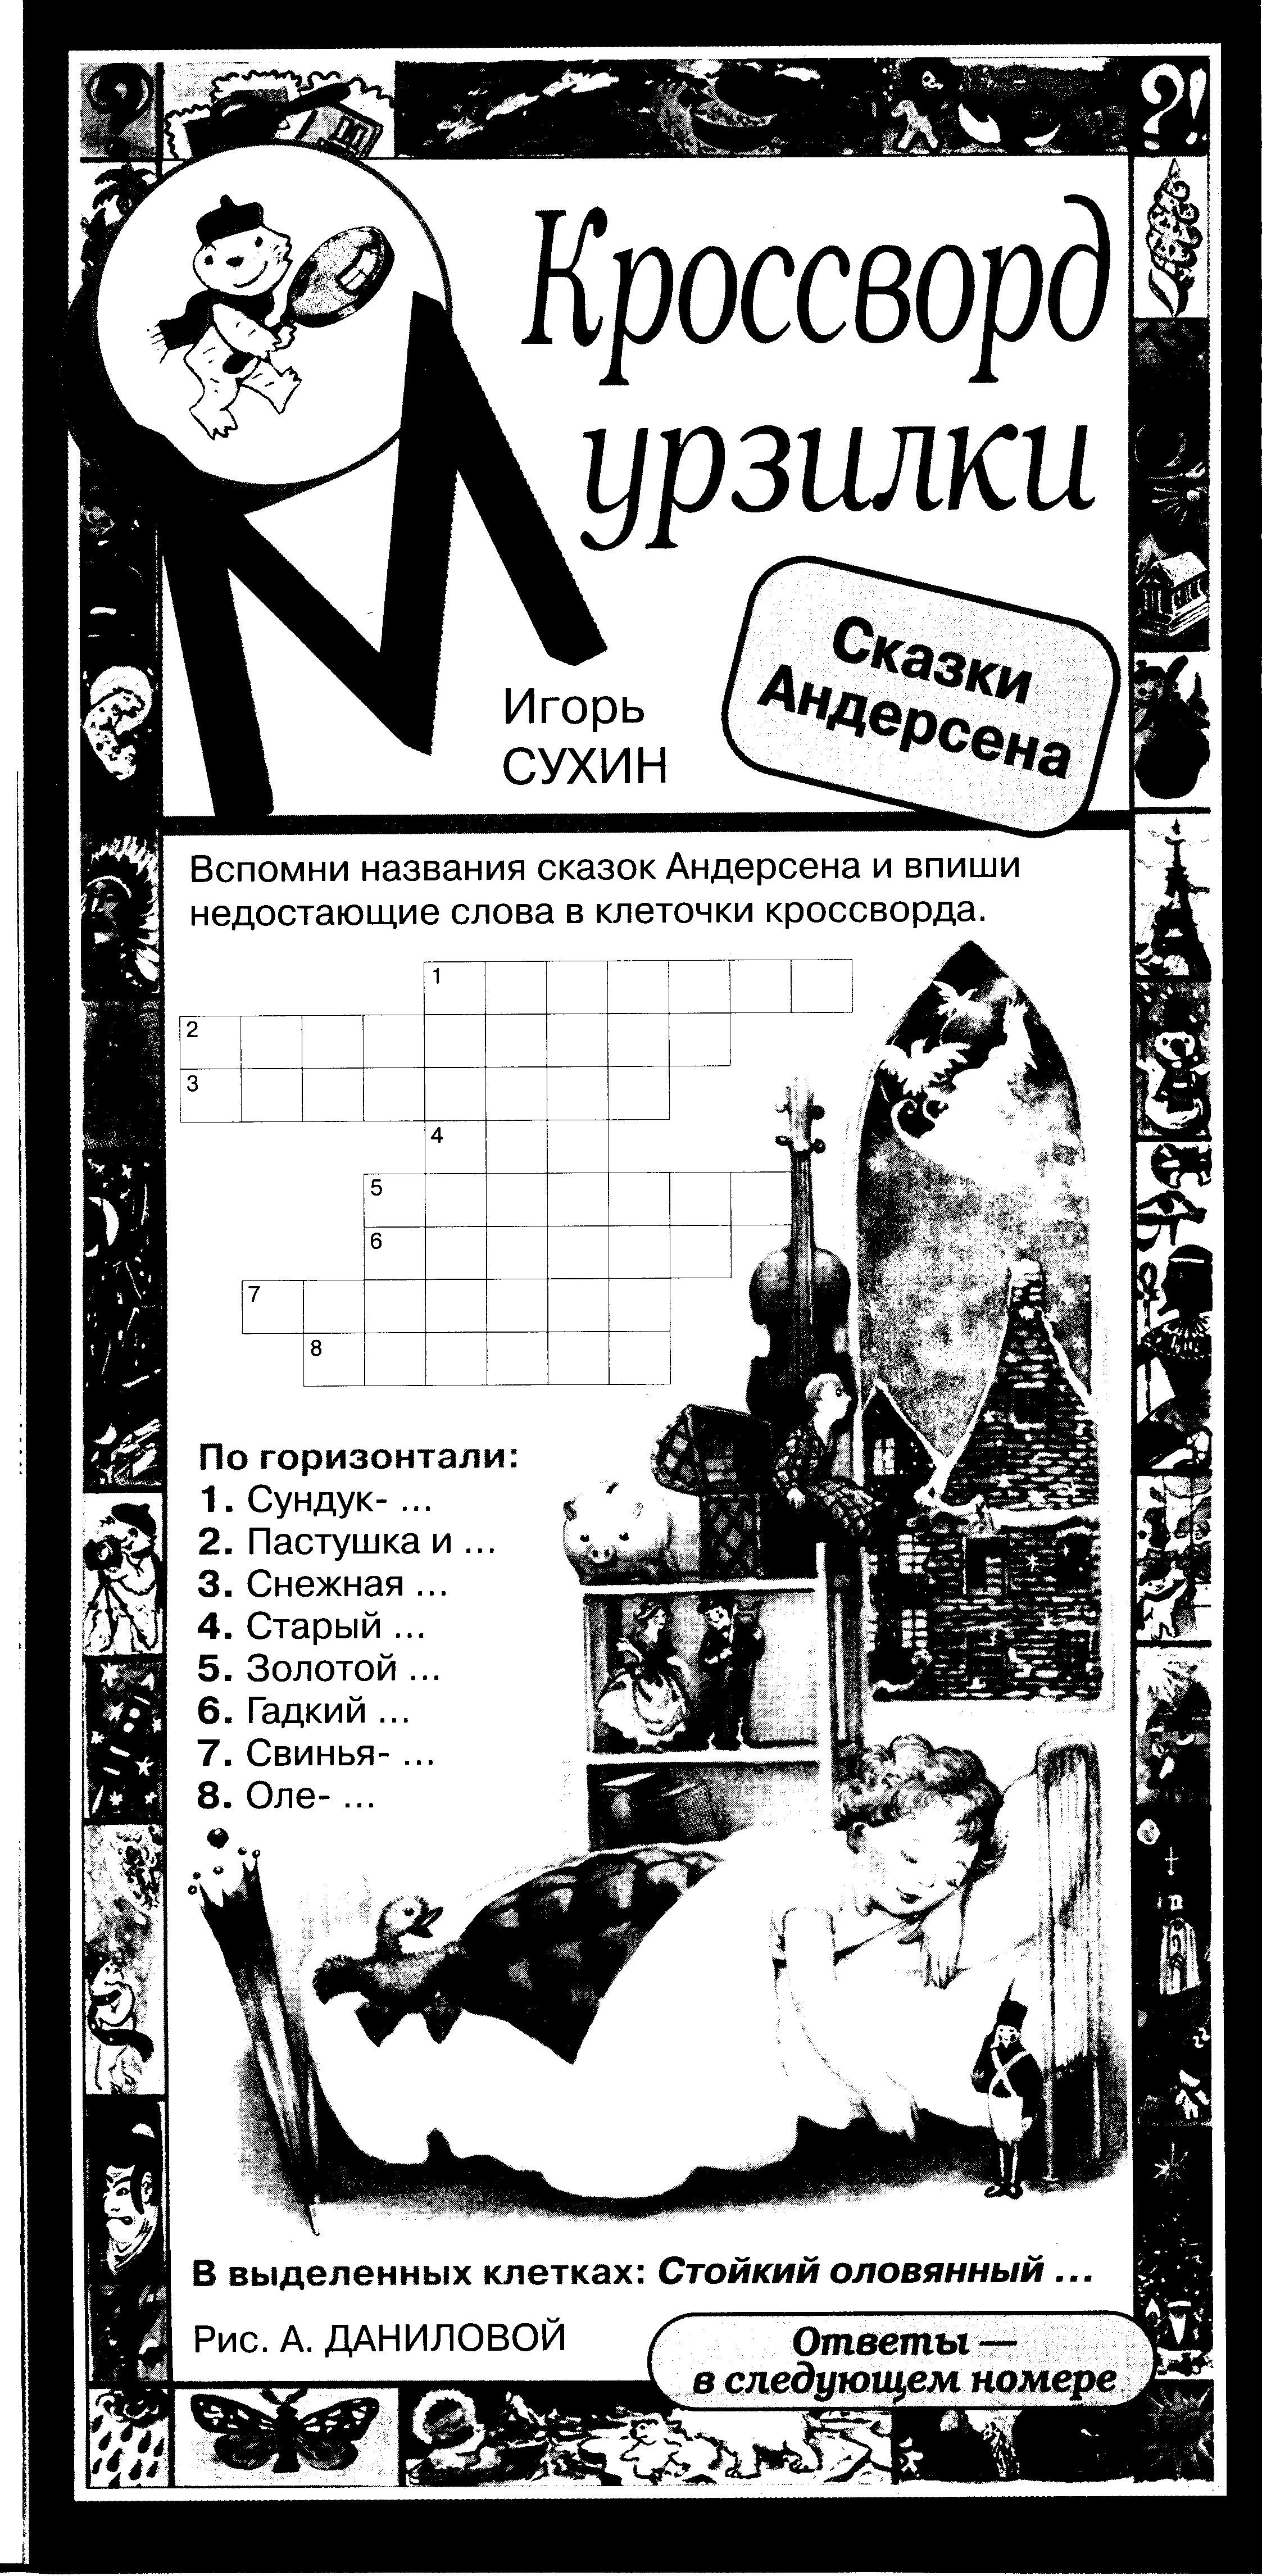 Кроссворд (1)